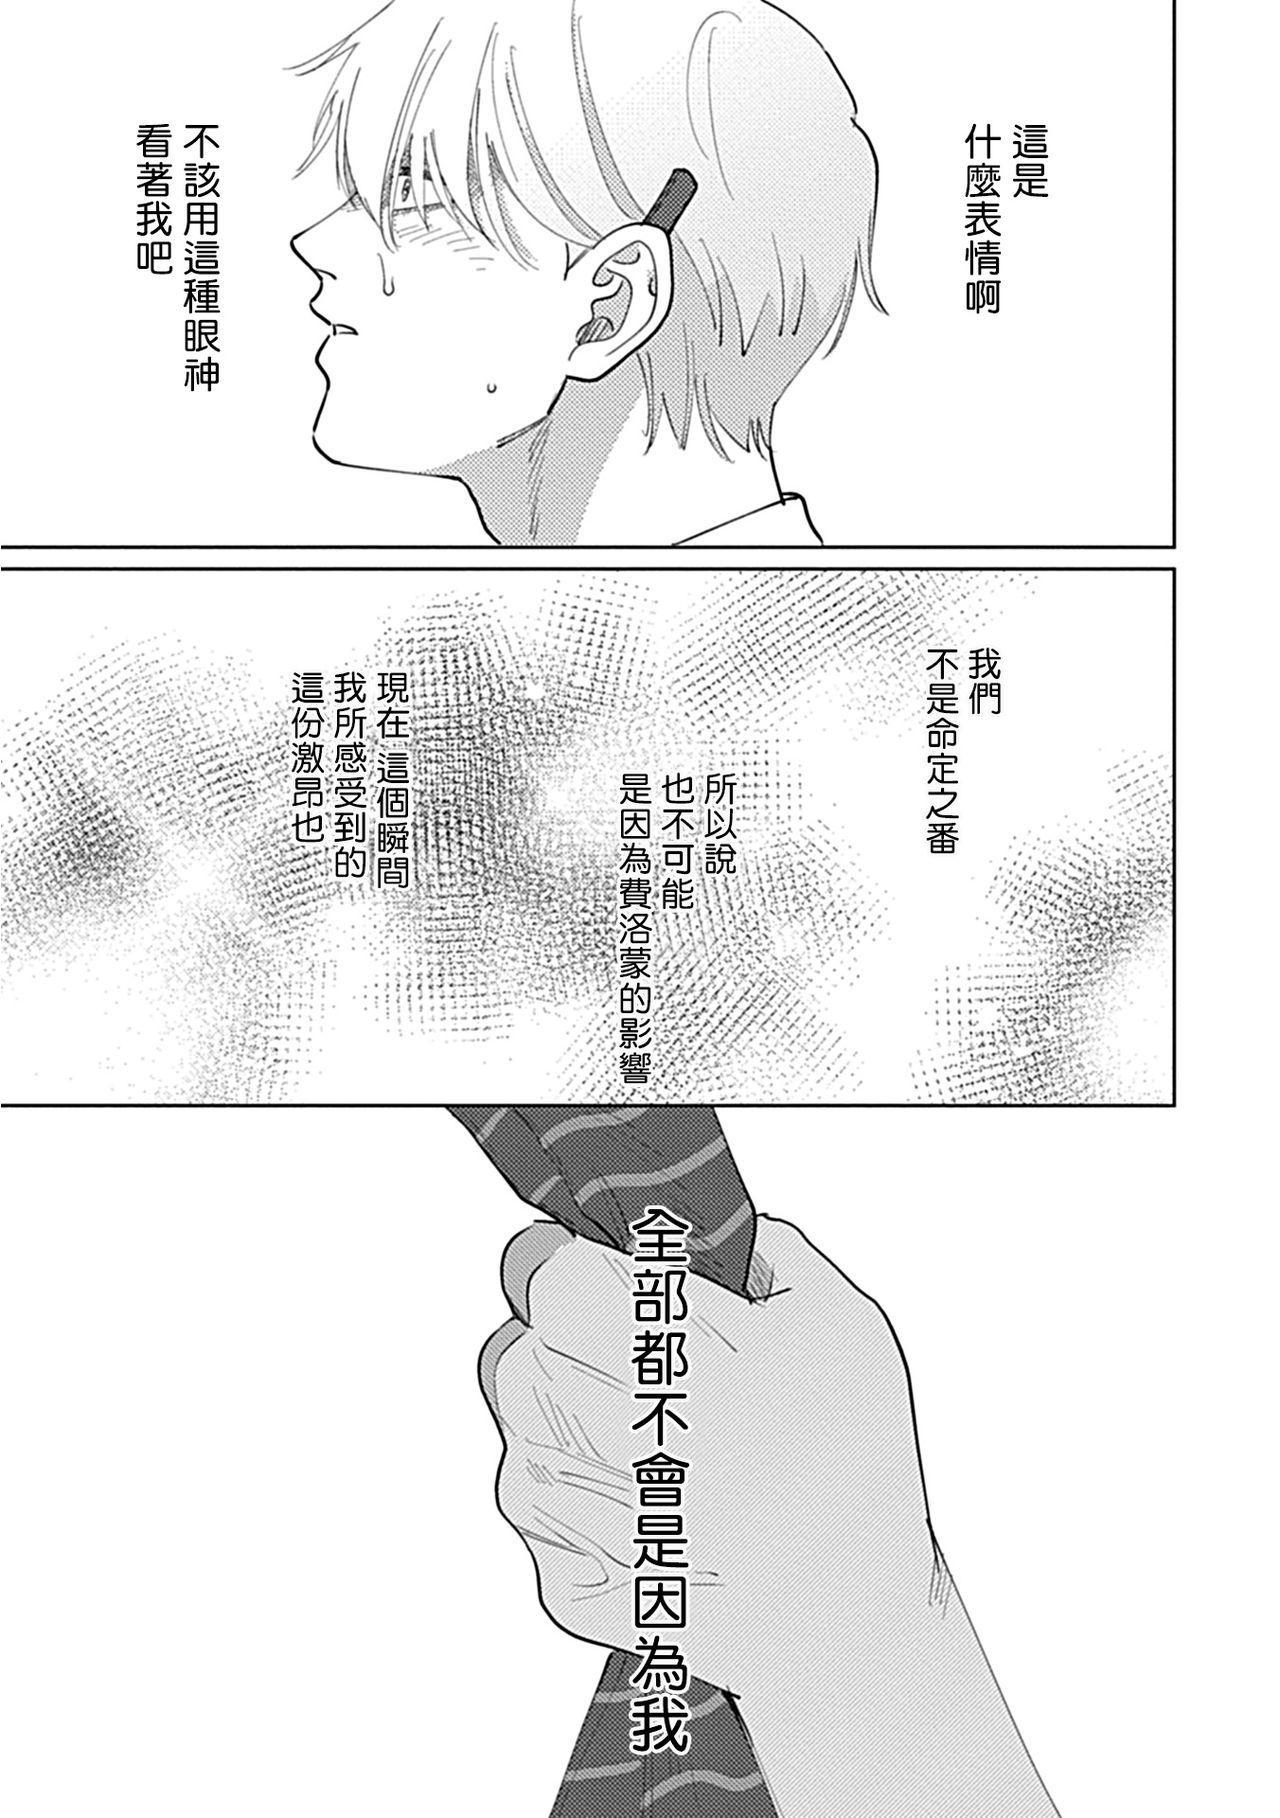 Bokura wa Unmei Janai | 我们不是命定之番 1-3 30